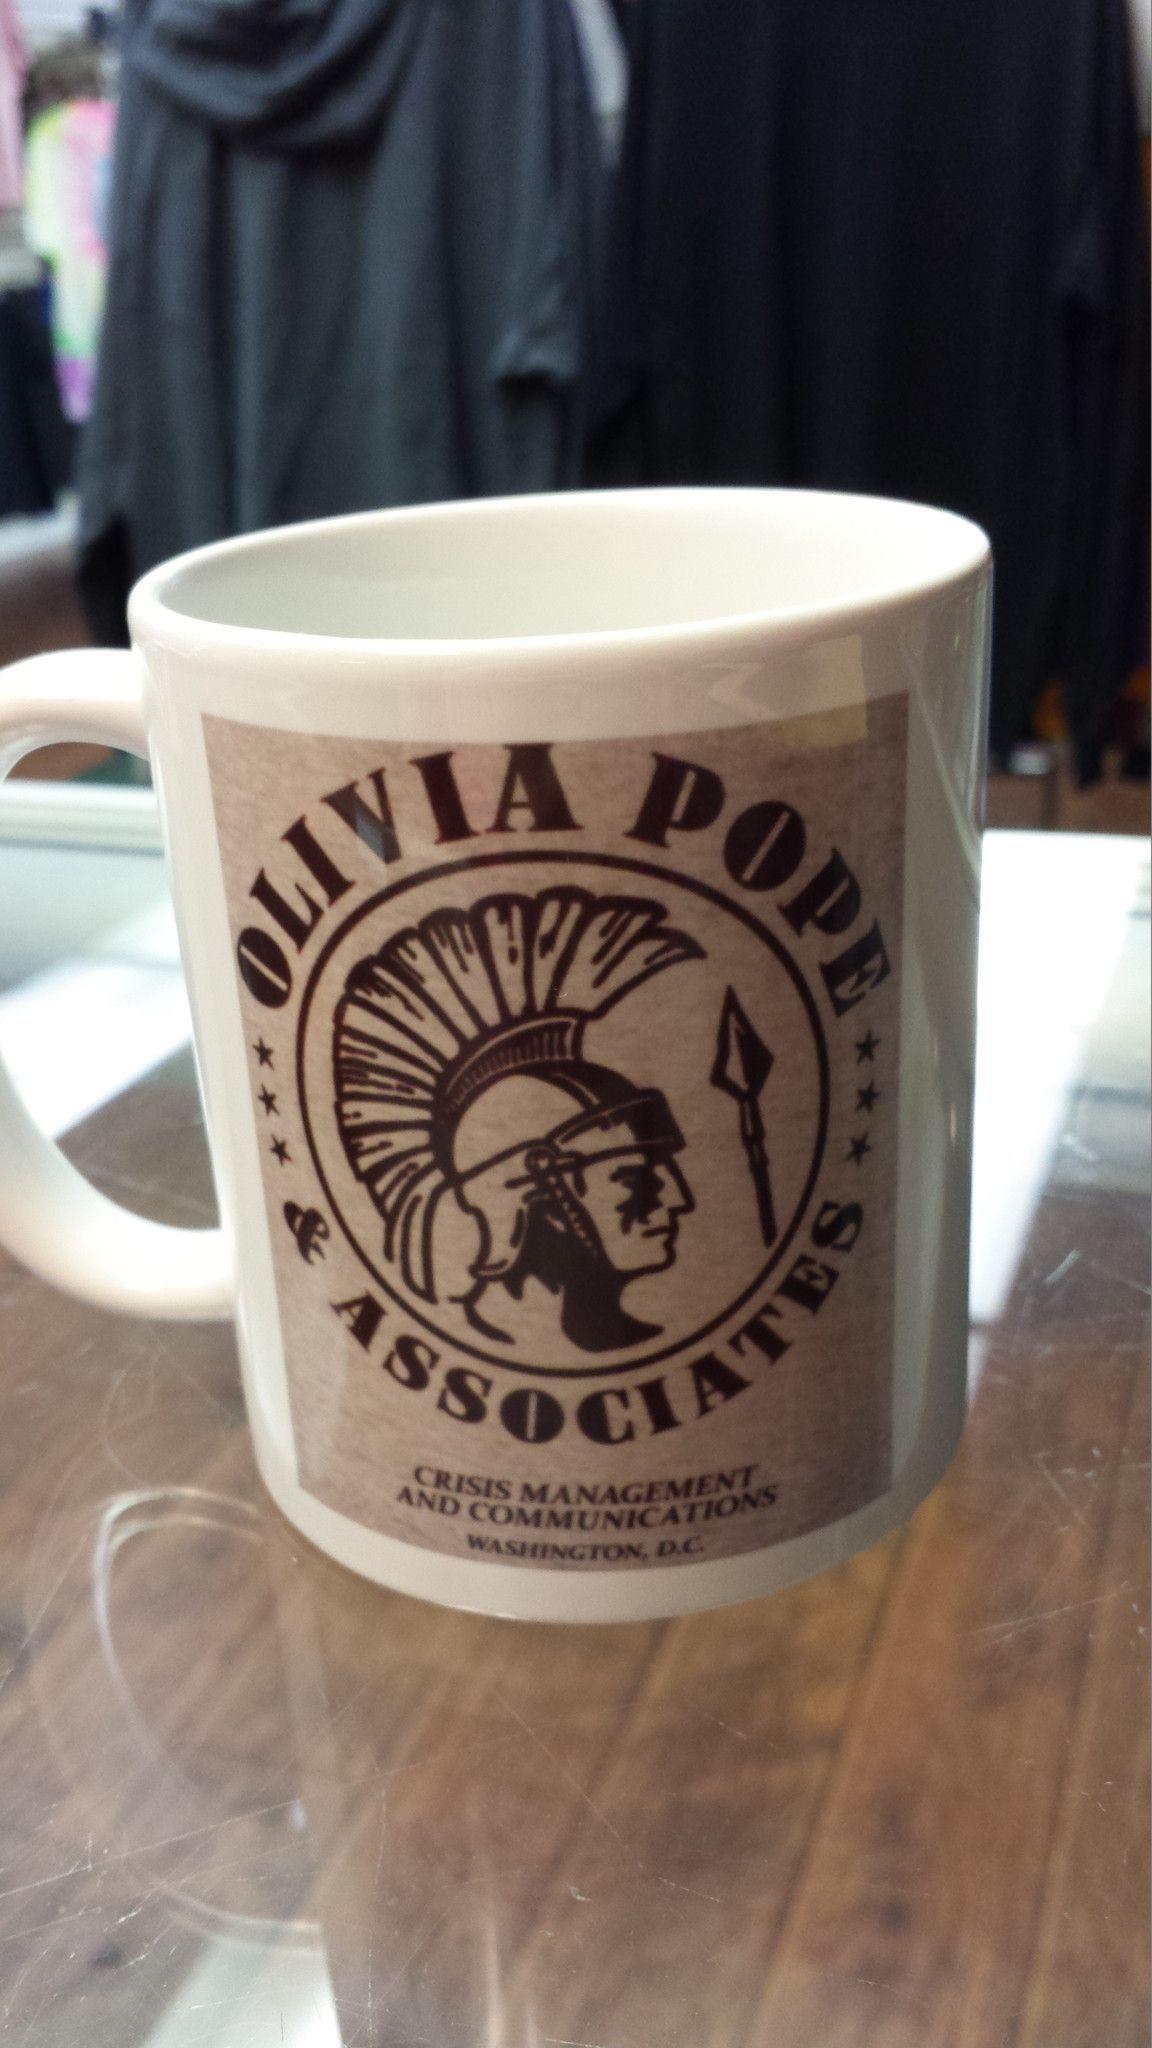 Olivia Pope and Associates Scandal coffee mug